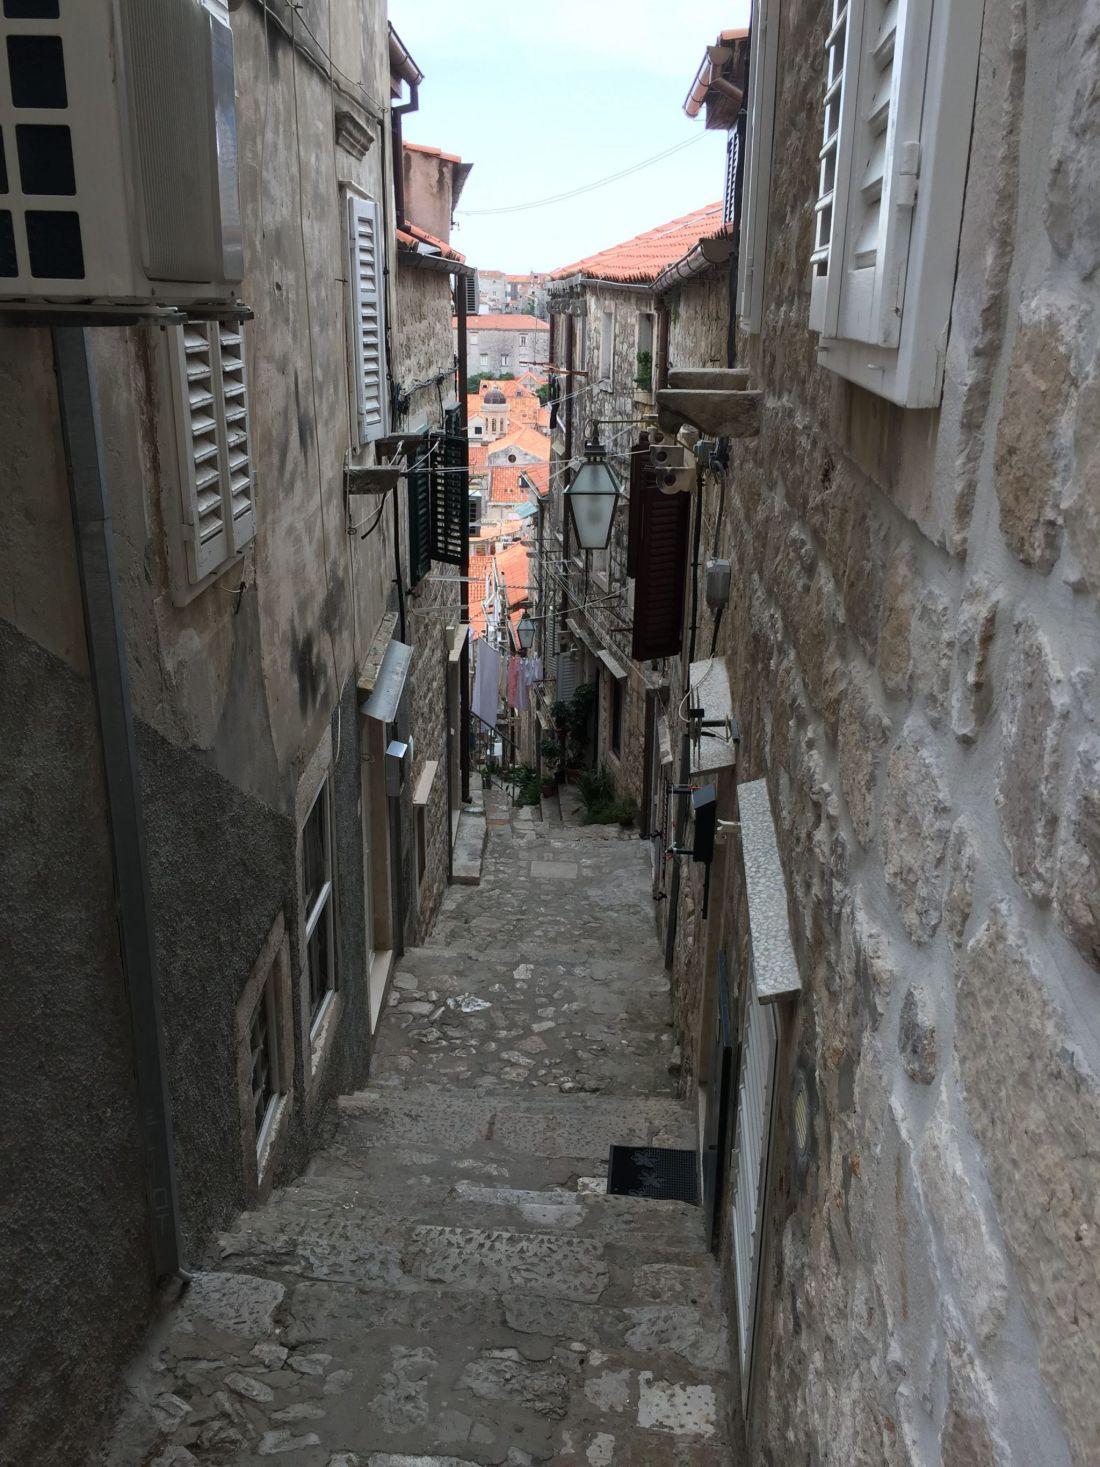 Steep streets of Dubrovnik, Croatia